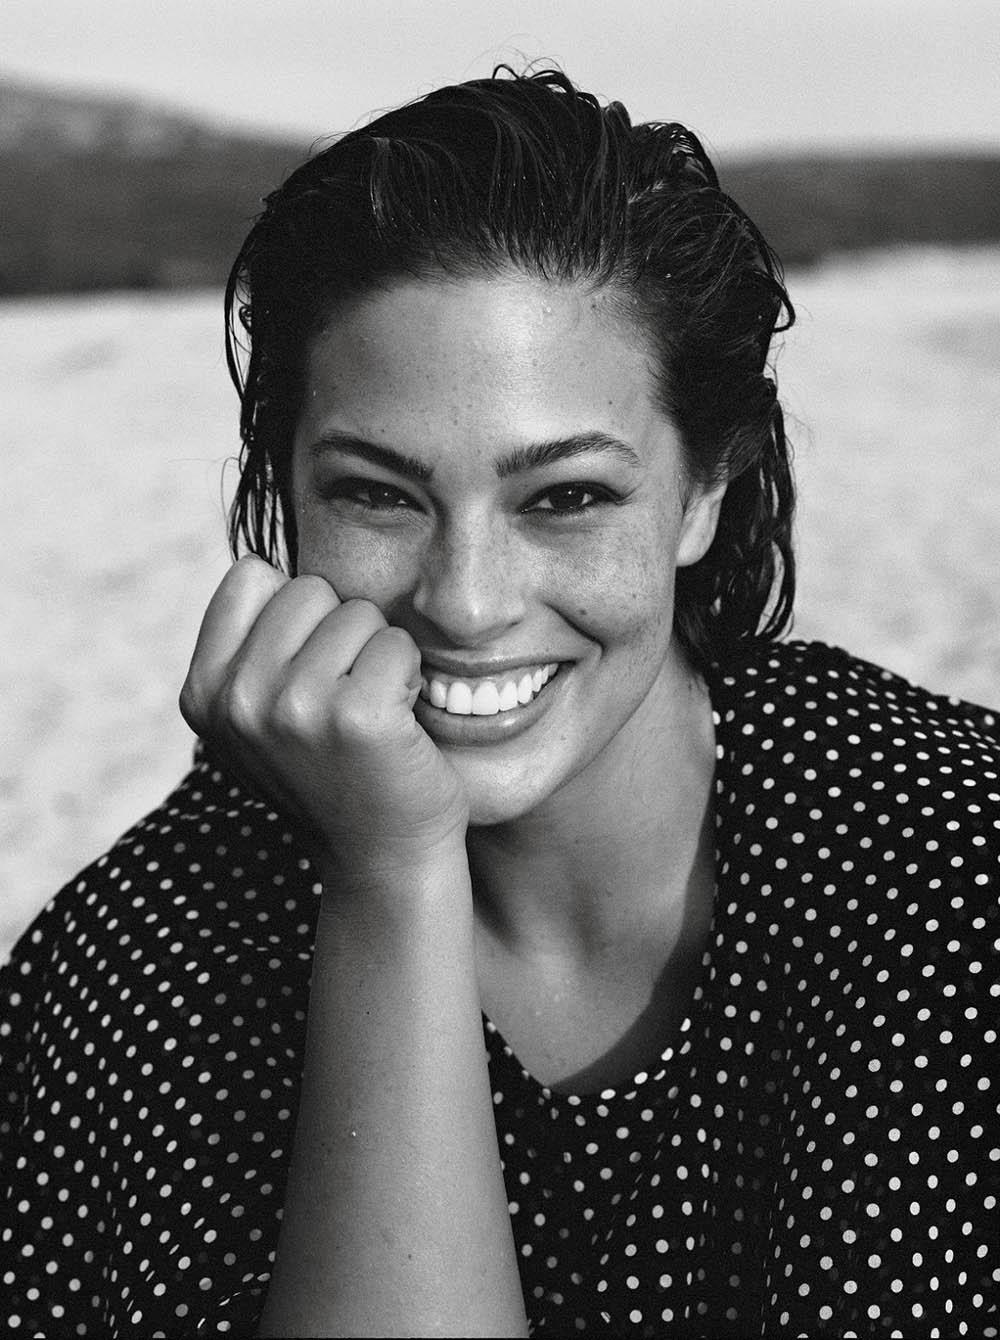 Ashley-Graham-by-Lachlan-Bailey-for-Vogue-Paris-November-2018-4.jpg